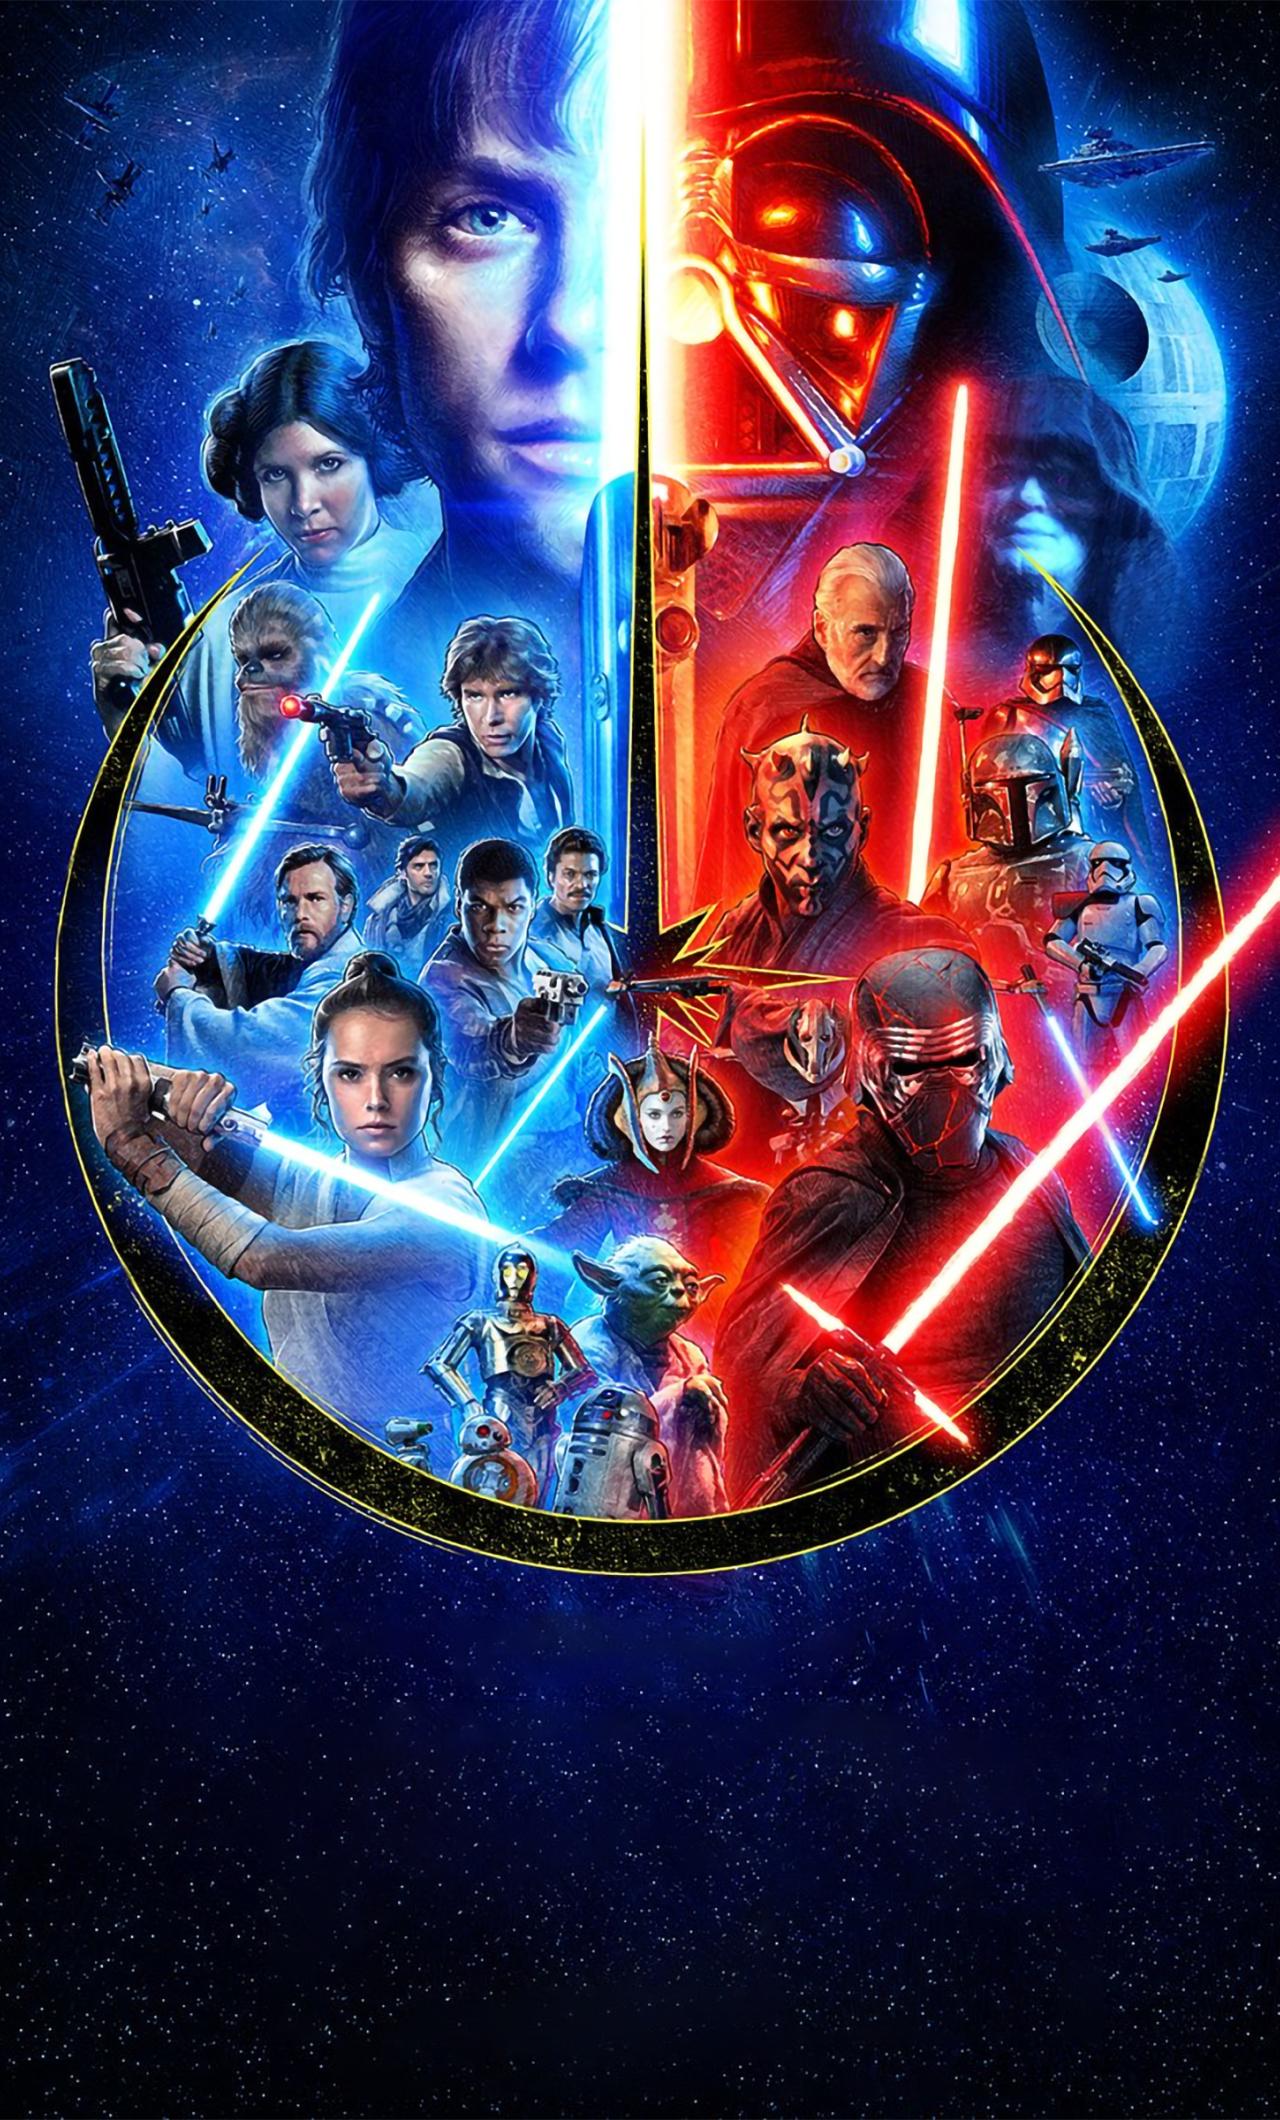 1280x2120 Star Wars Skywalker Saga iPhone 6 plus Wallpaper ...